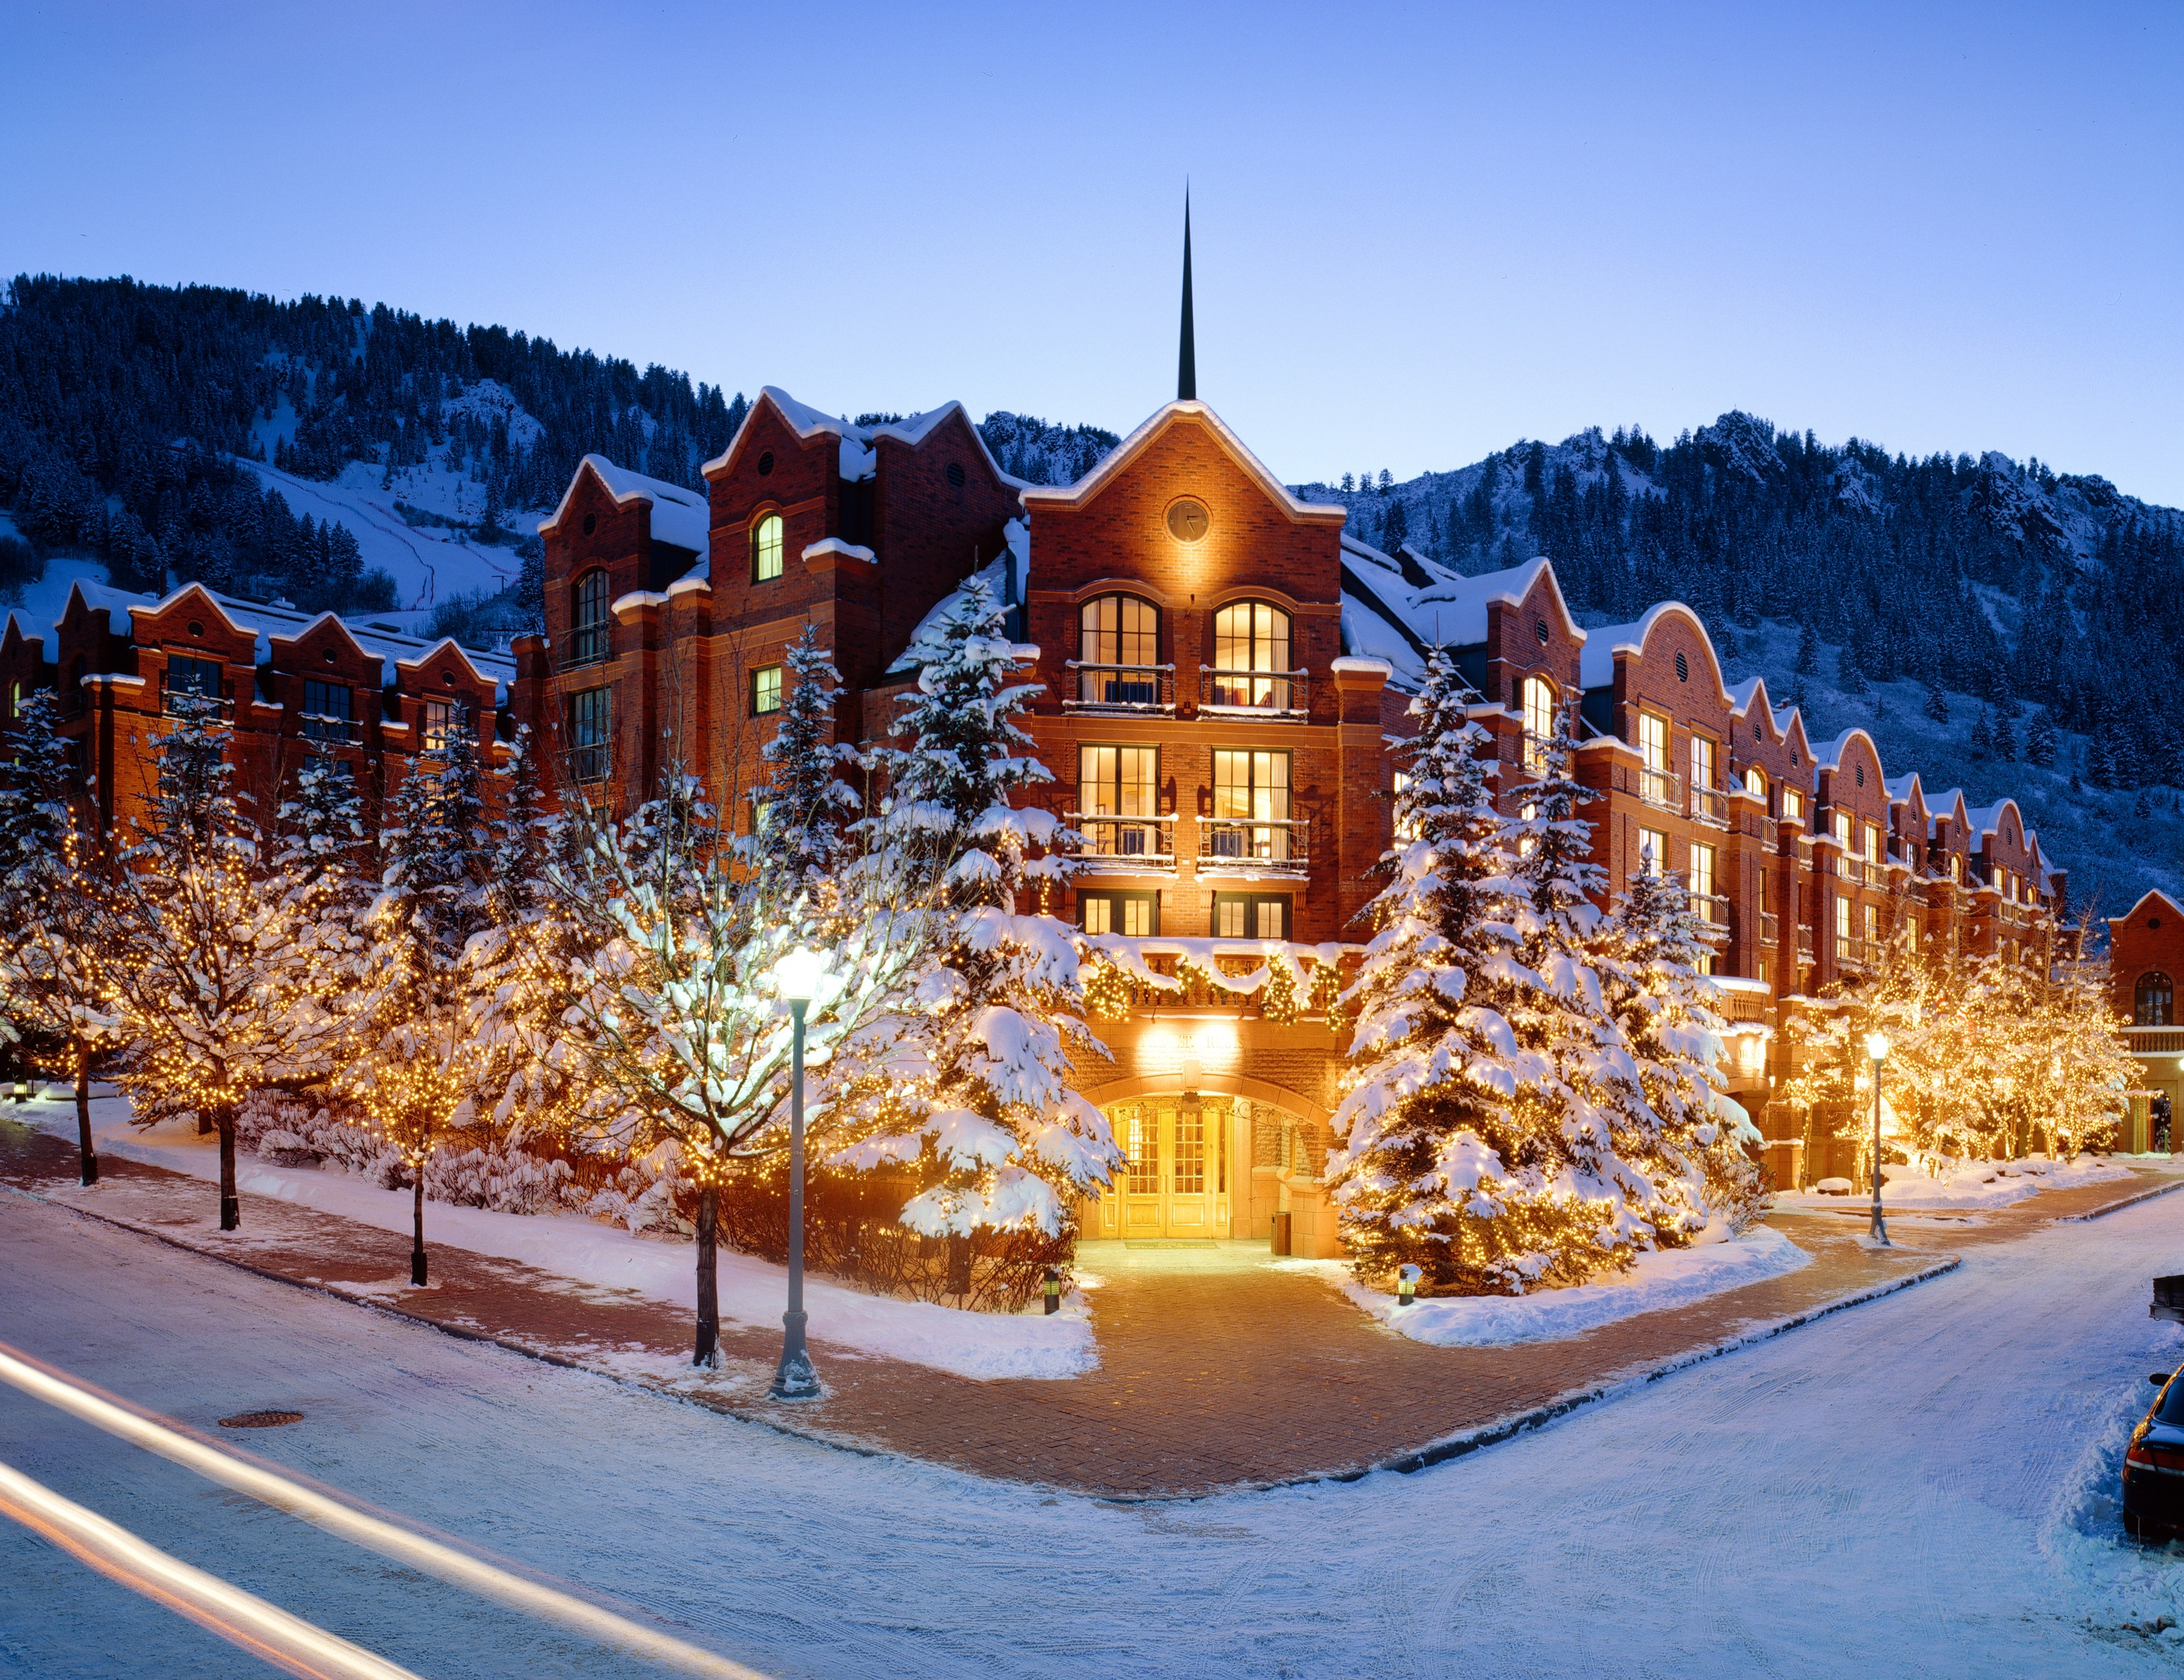 Visit the most exclusive ski resorts rancho santa fe for Ski cabins in colorado